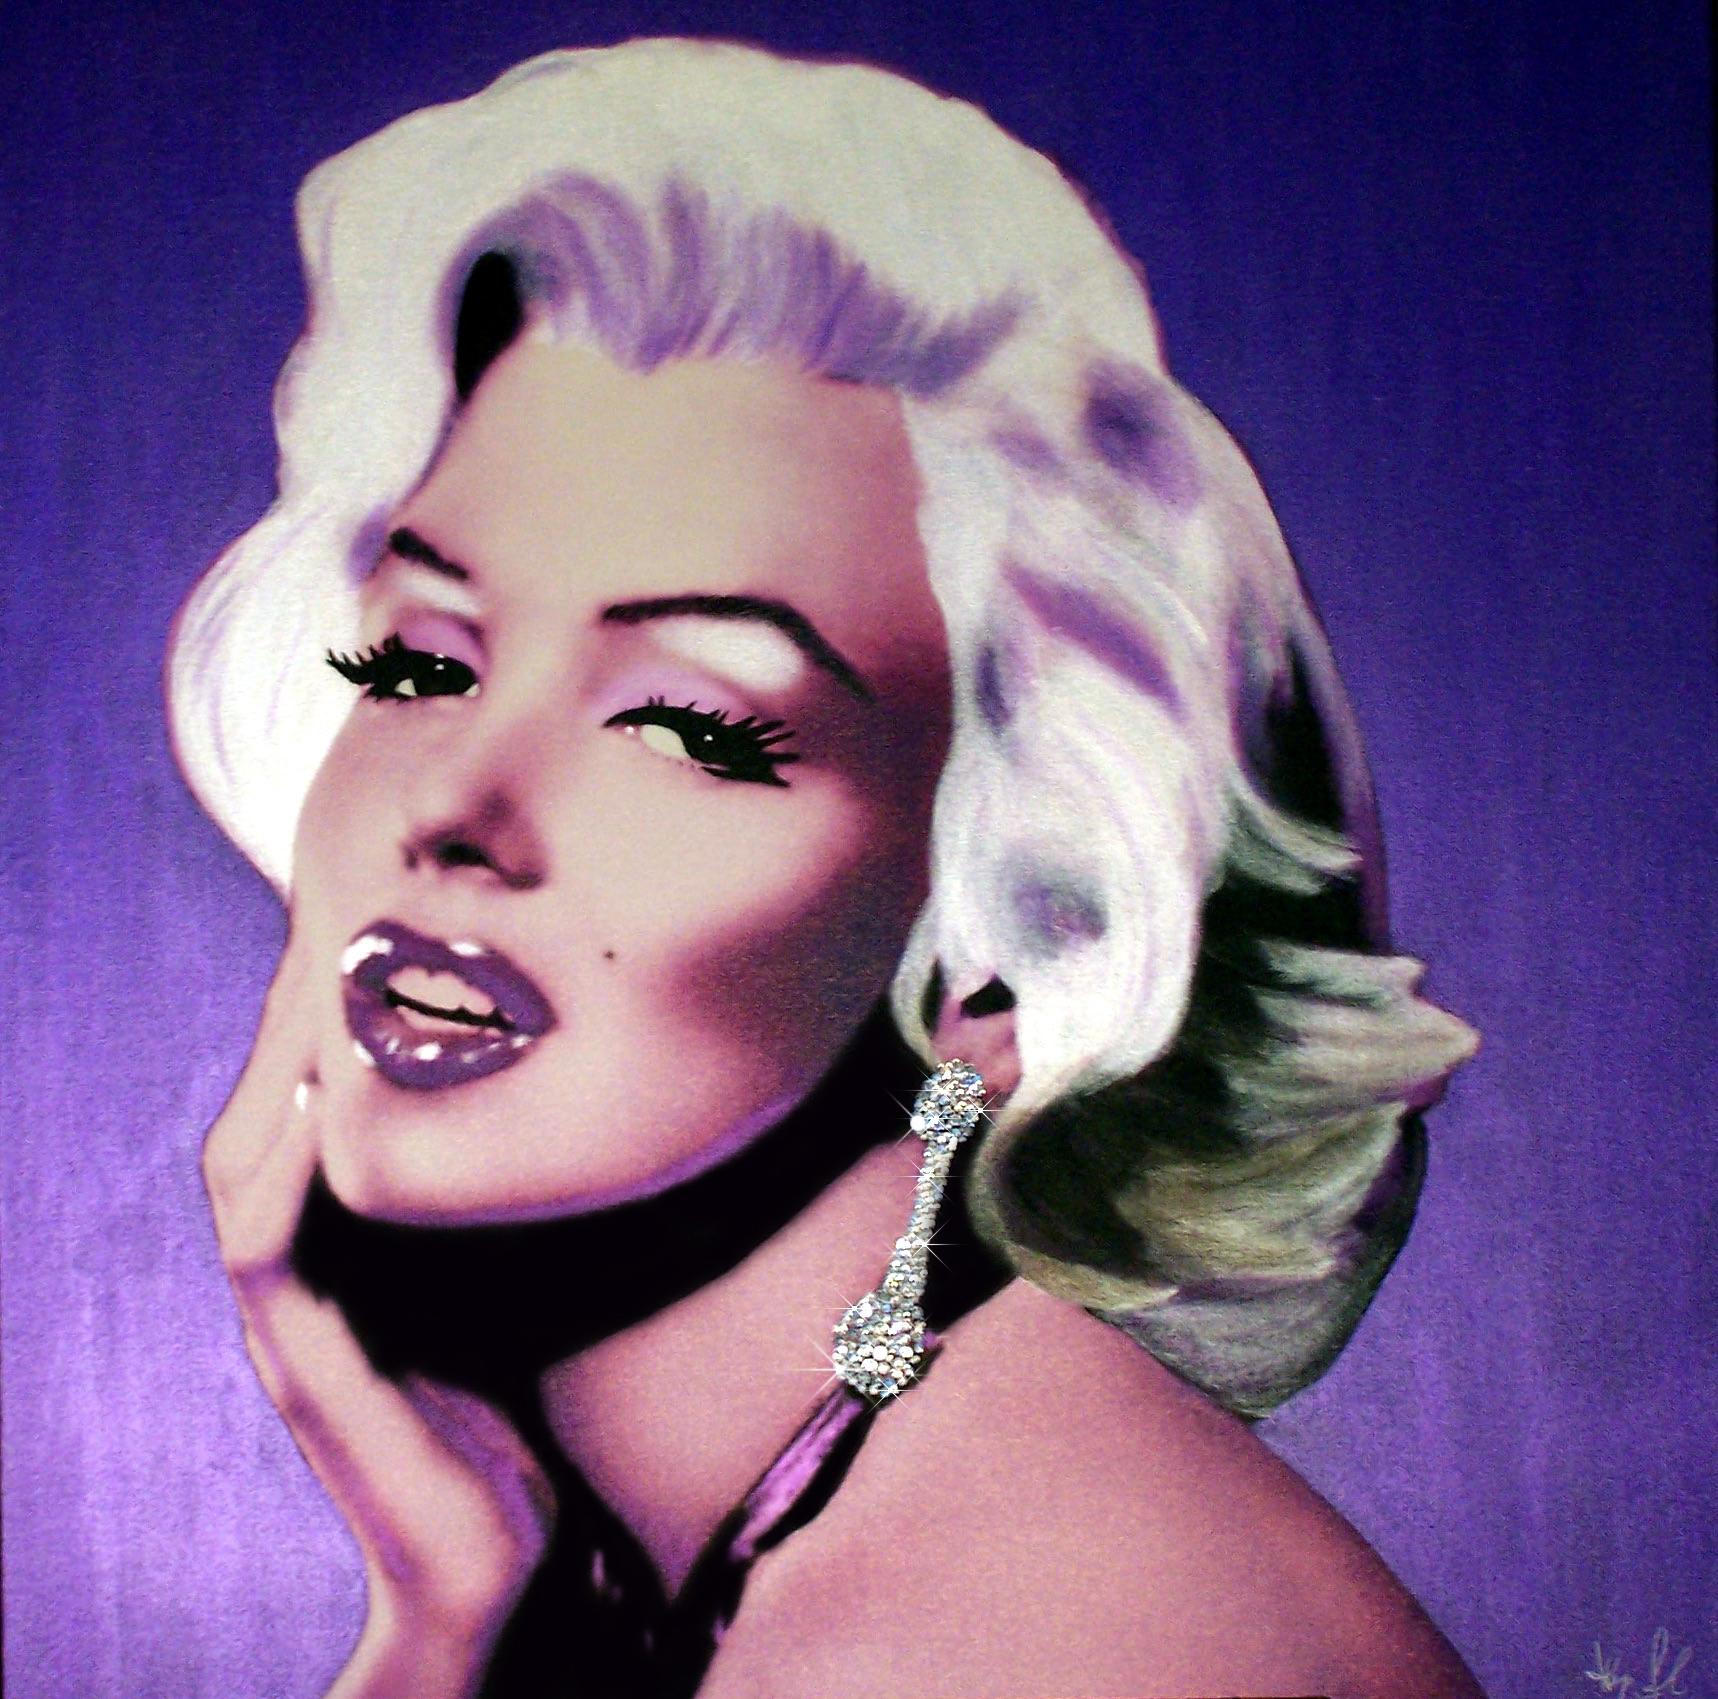 monroe-desire-purple-94cmx98cm-36x40.jpg